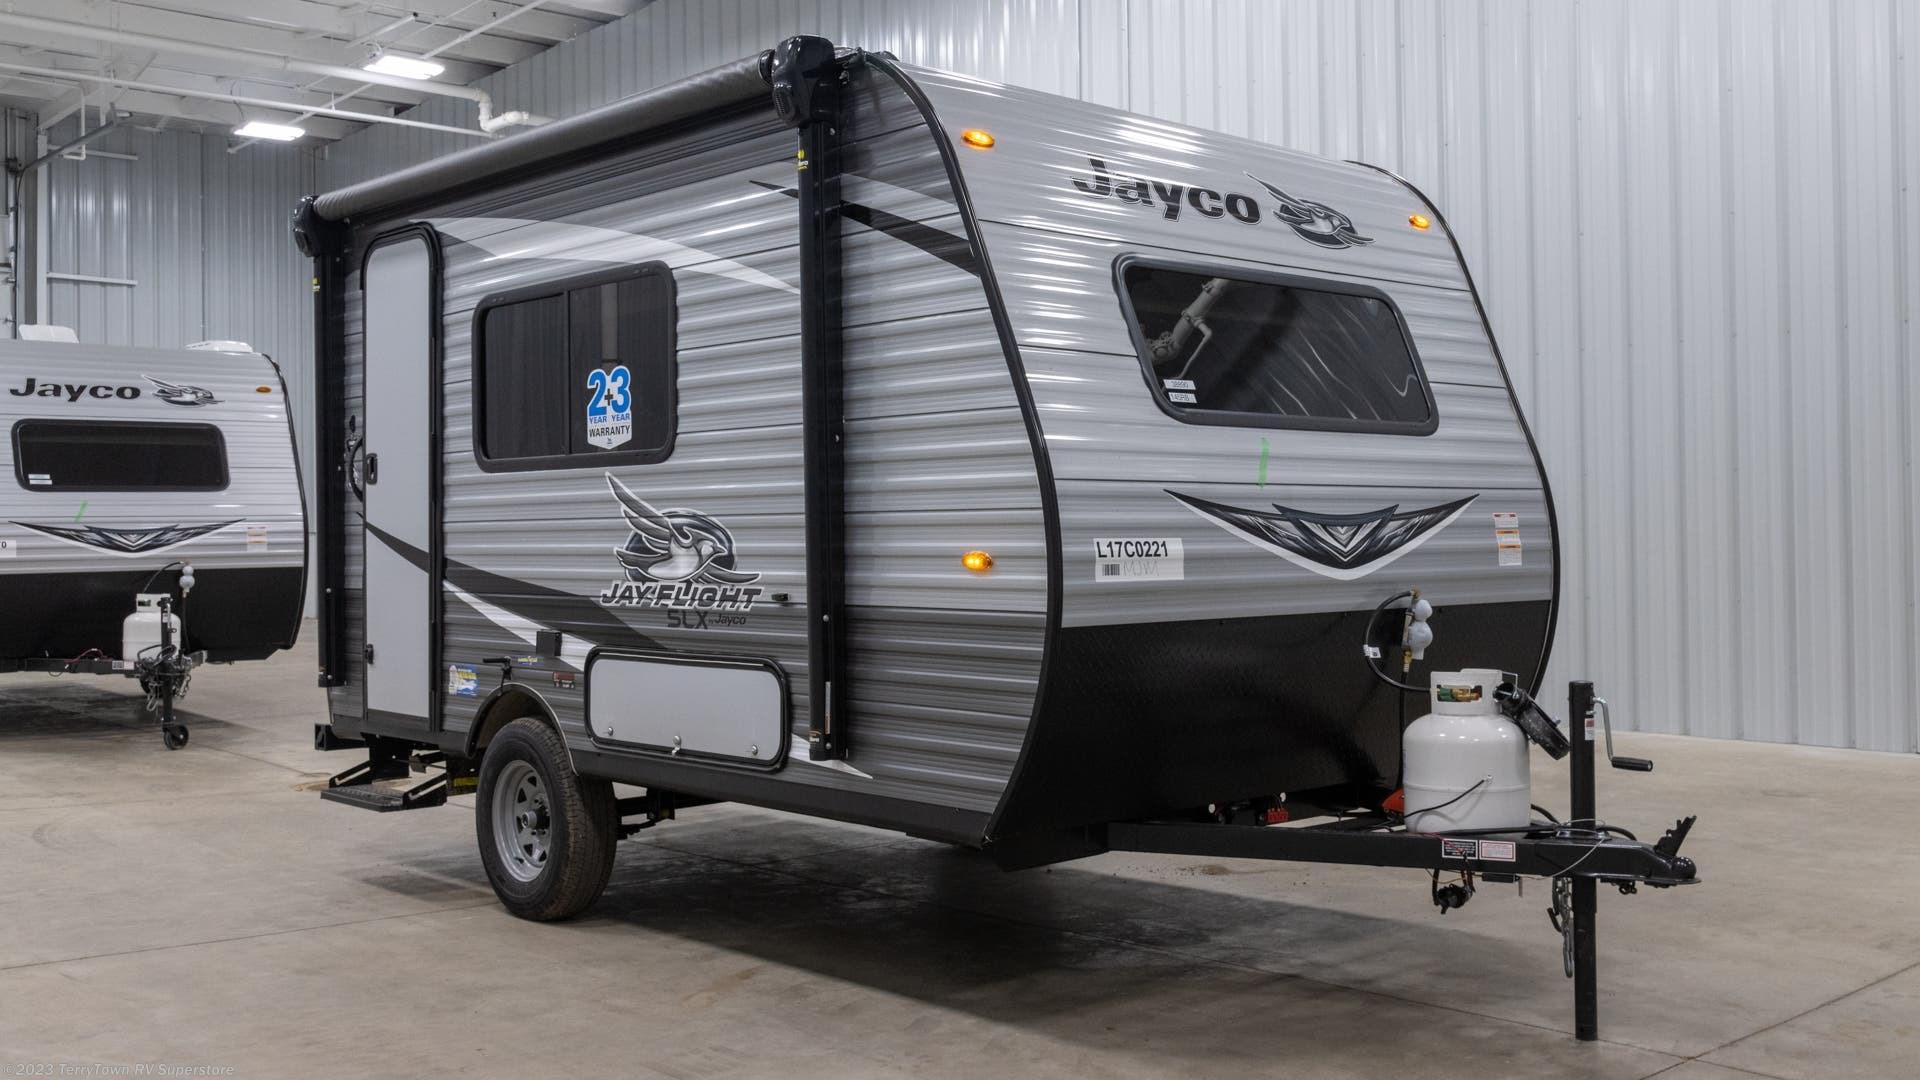 2020 Jayco Jay Flight SLX 7 145RB RV for Sale in Grand ...